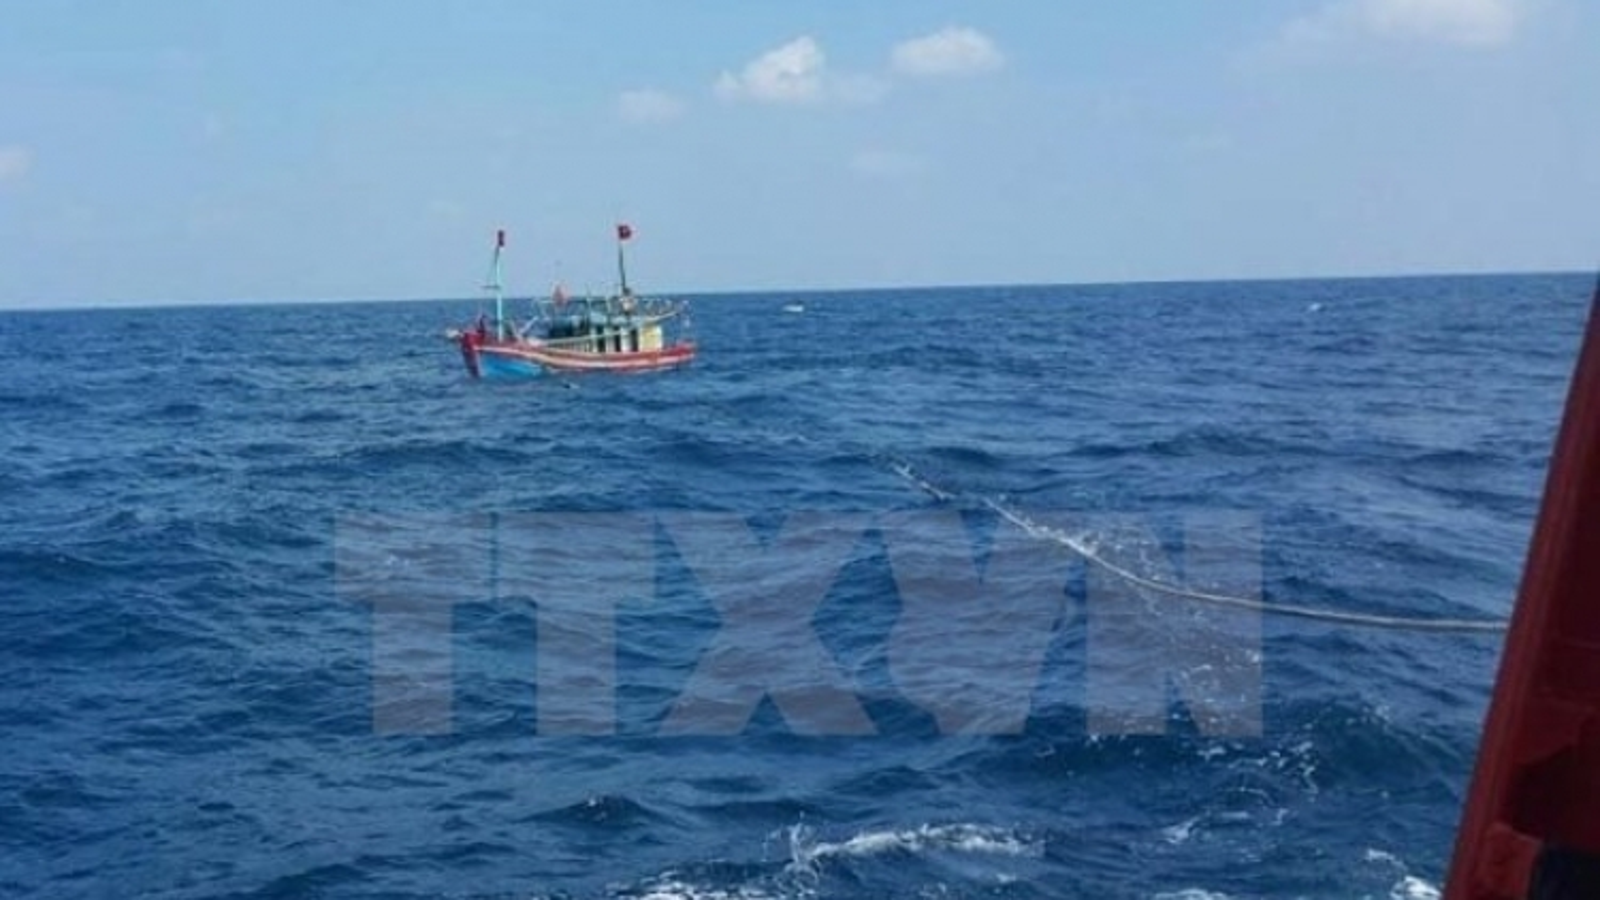 ASEAN needs Code of Conduct in East Sea soon